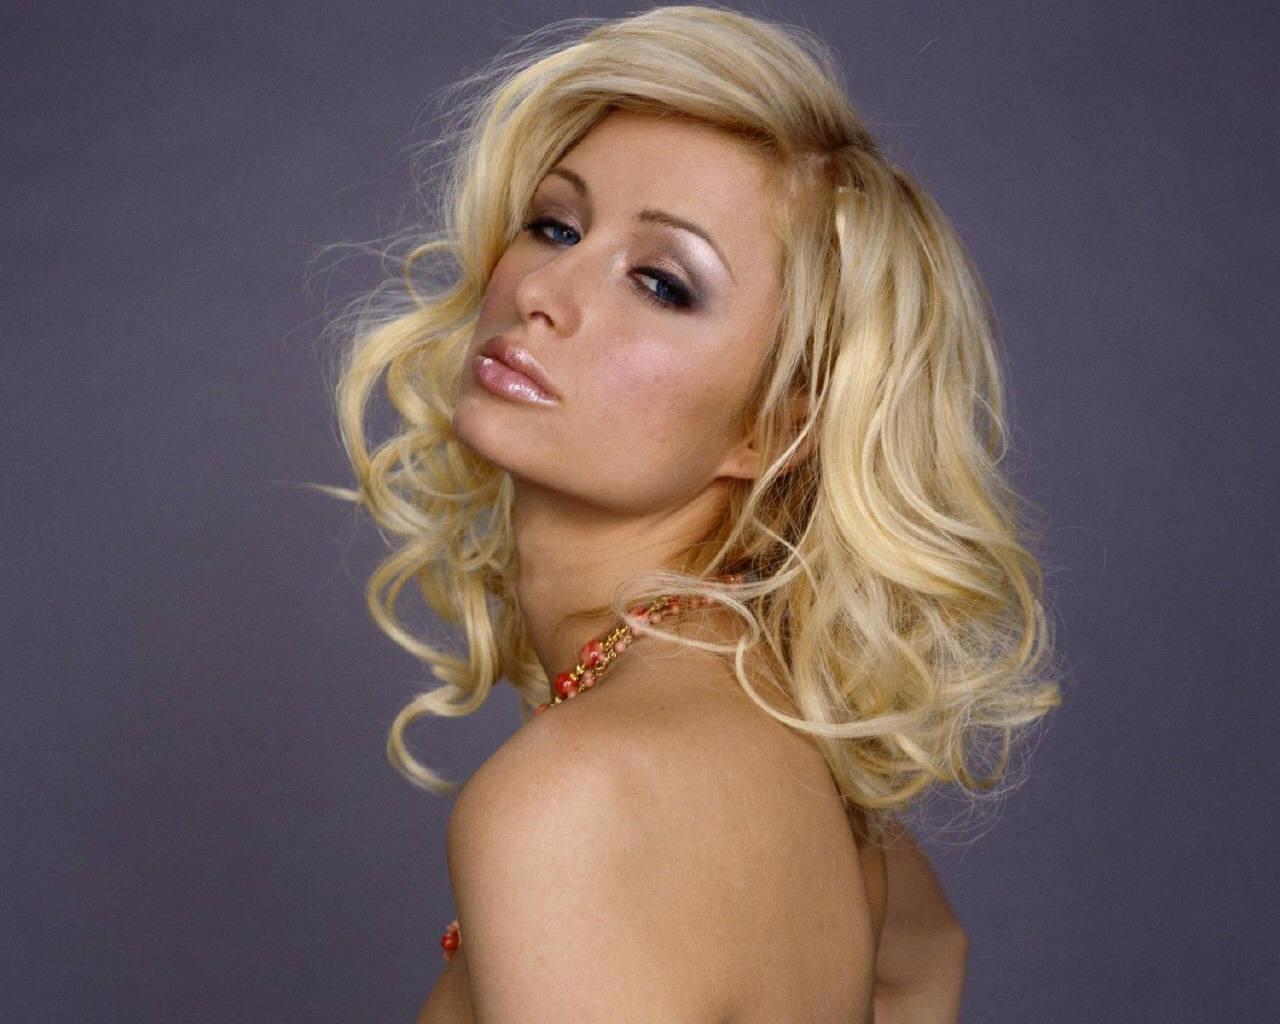 http://4.bp.blogspot.com/-y0S98tMle1E/US-iFFq8jWI/AAAAAAAA1f8/k23F86EhRnA/s1600/Paris-Hilton-lips.jpg